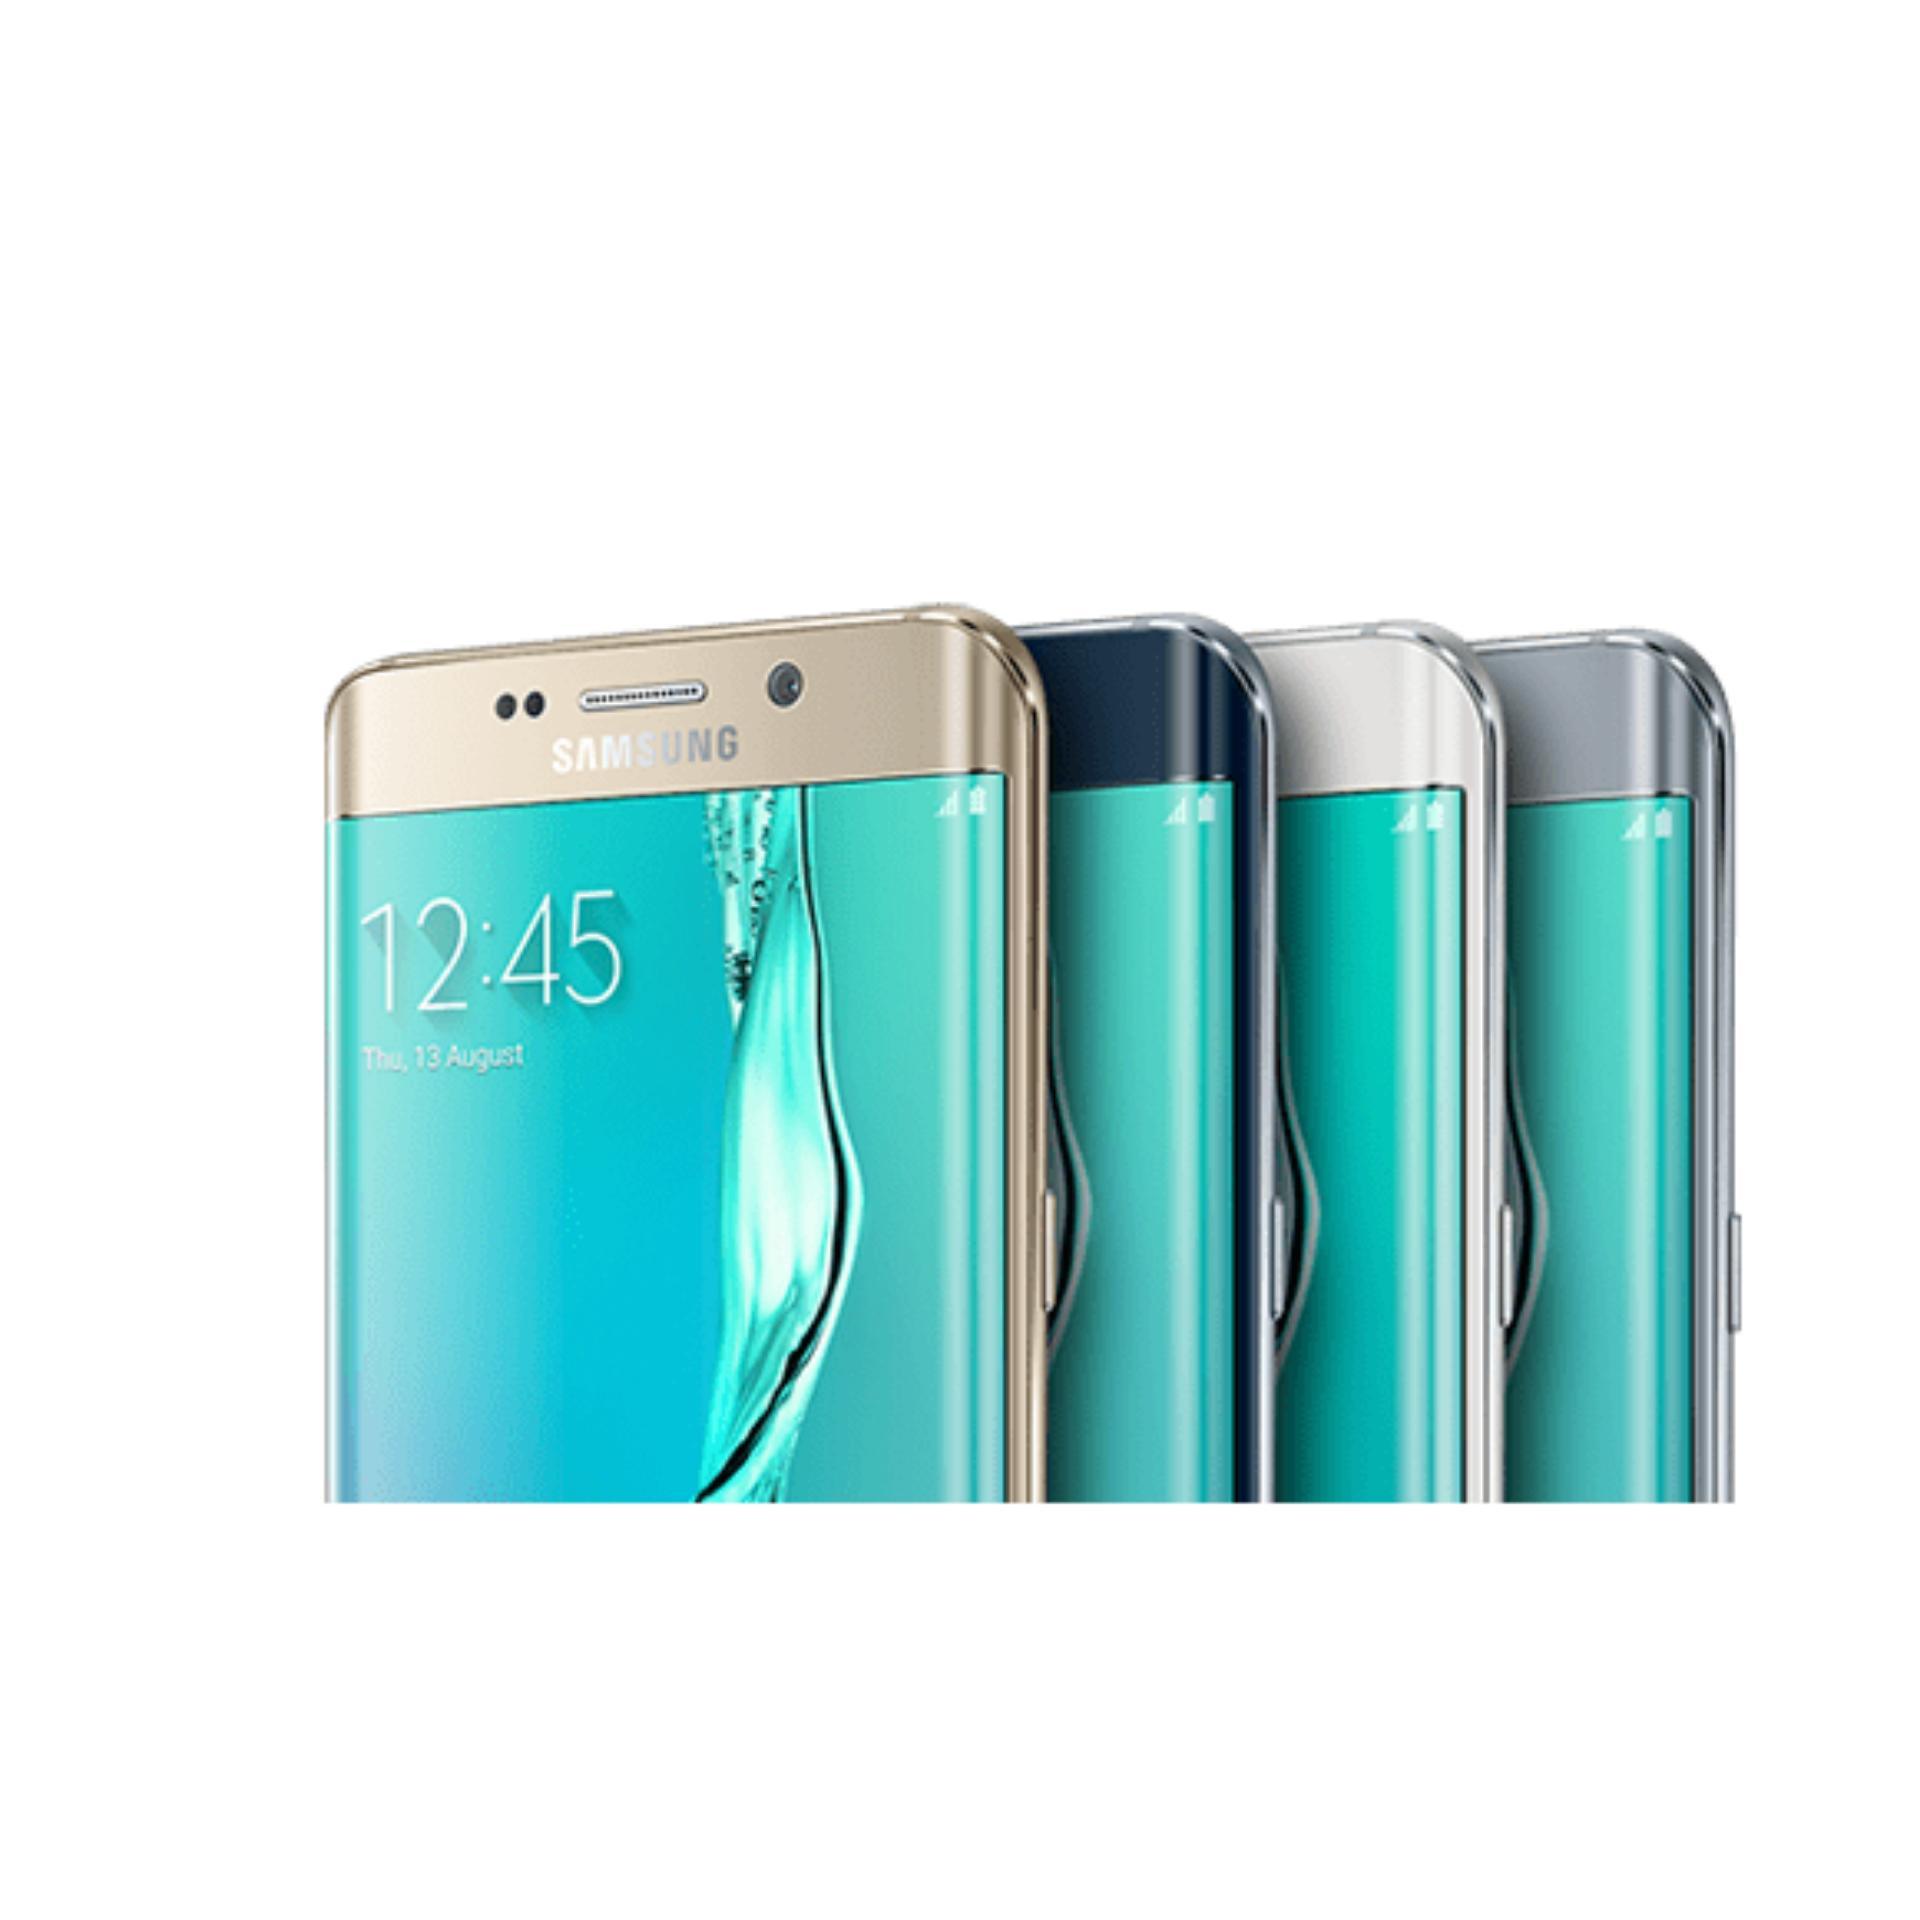 Beli Samsung Galaxy J2 Prime Garansi Resmi Sein Hitam J1 2016 S6 Edge Plus